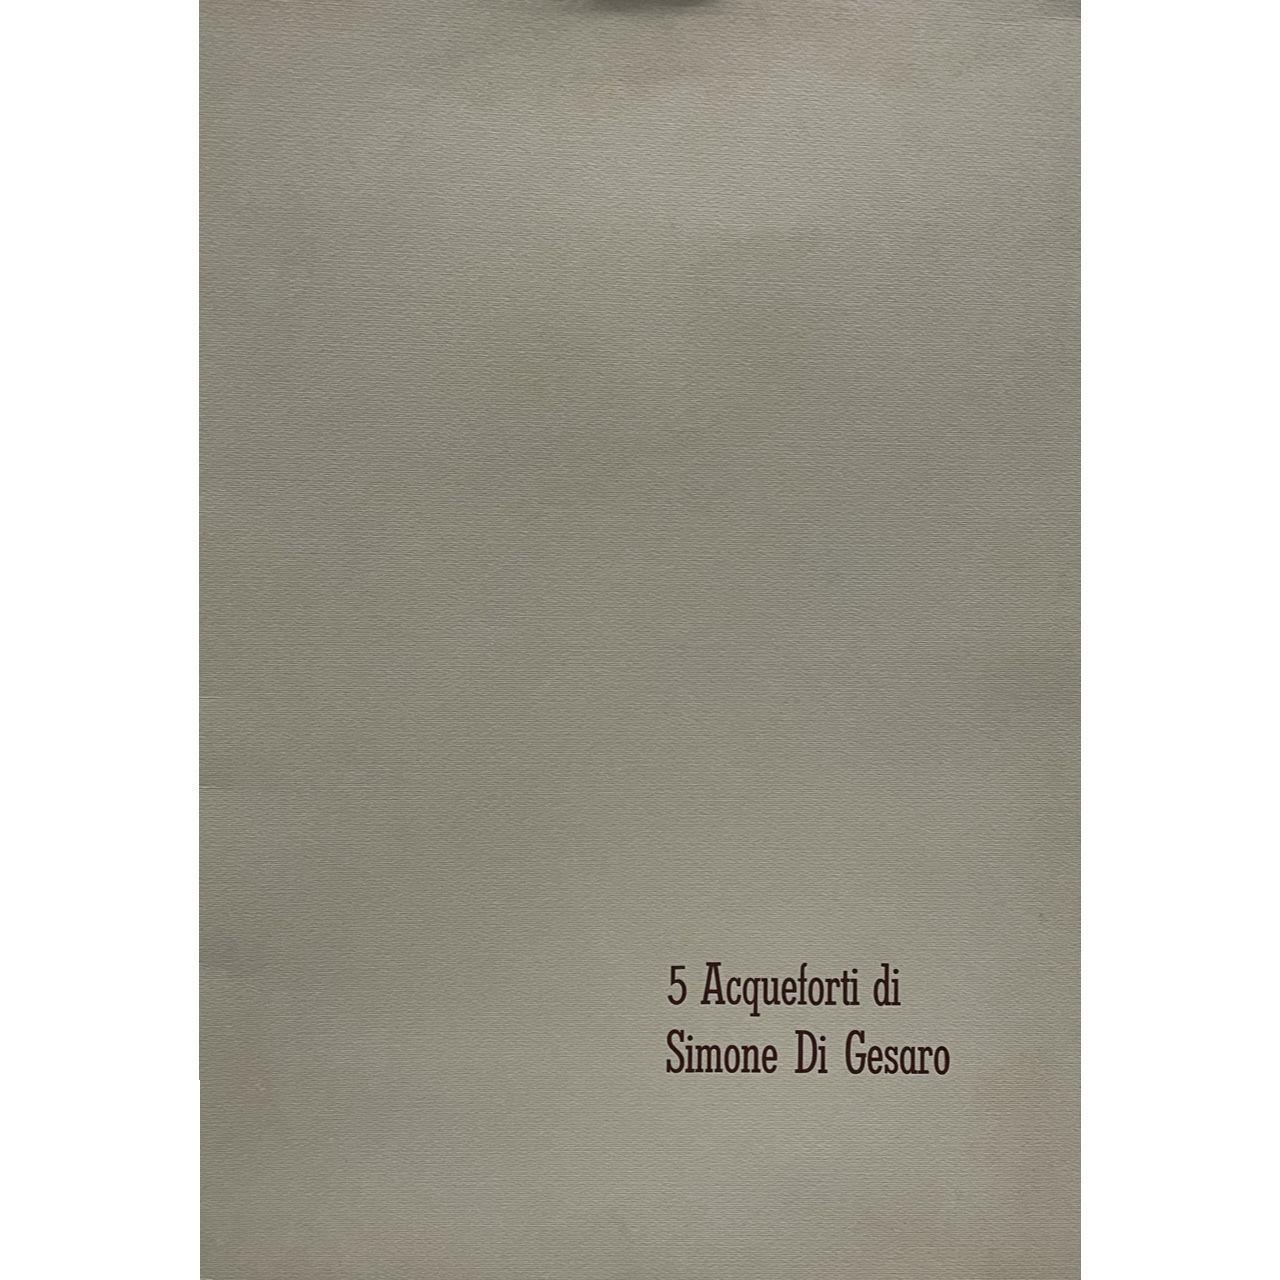 Immagine di Cartella 5 acqueforti